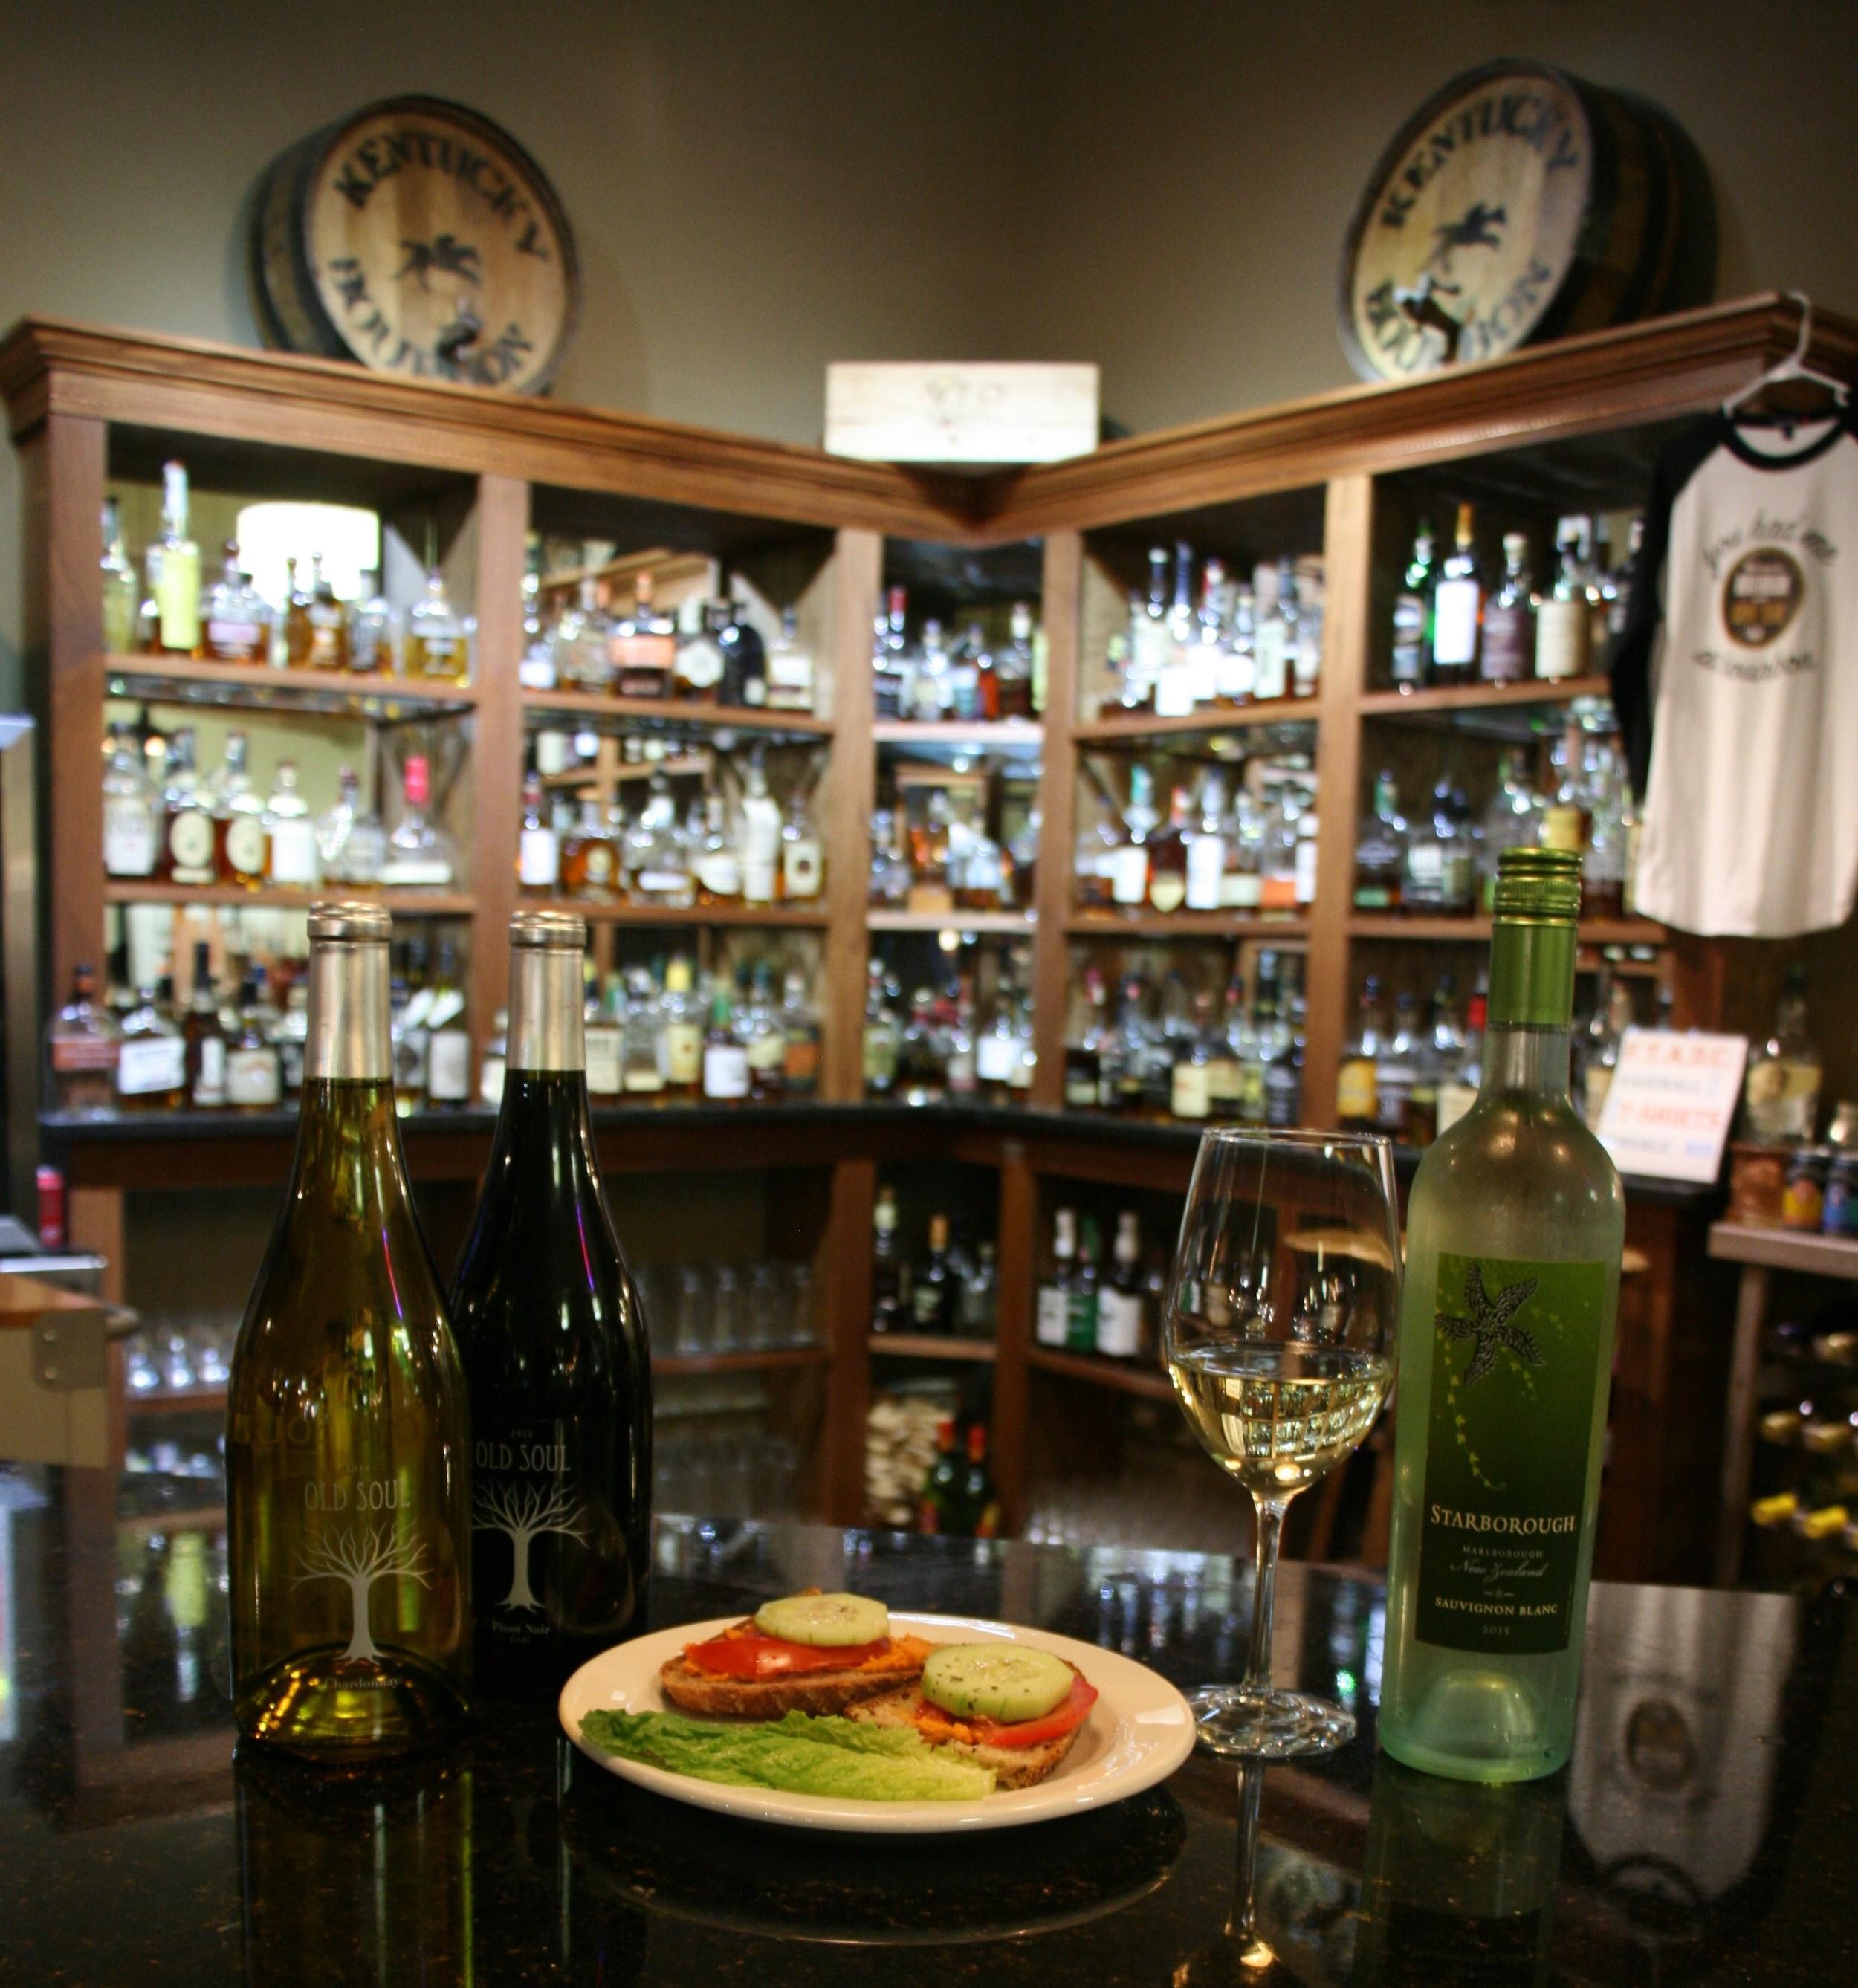 Think FRESH !! Blue Oven Bakery Bread, Neltner's Farm Fresh Tomato & Cucumber along w/ roasted red pepper humus !!!